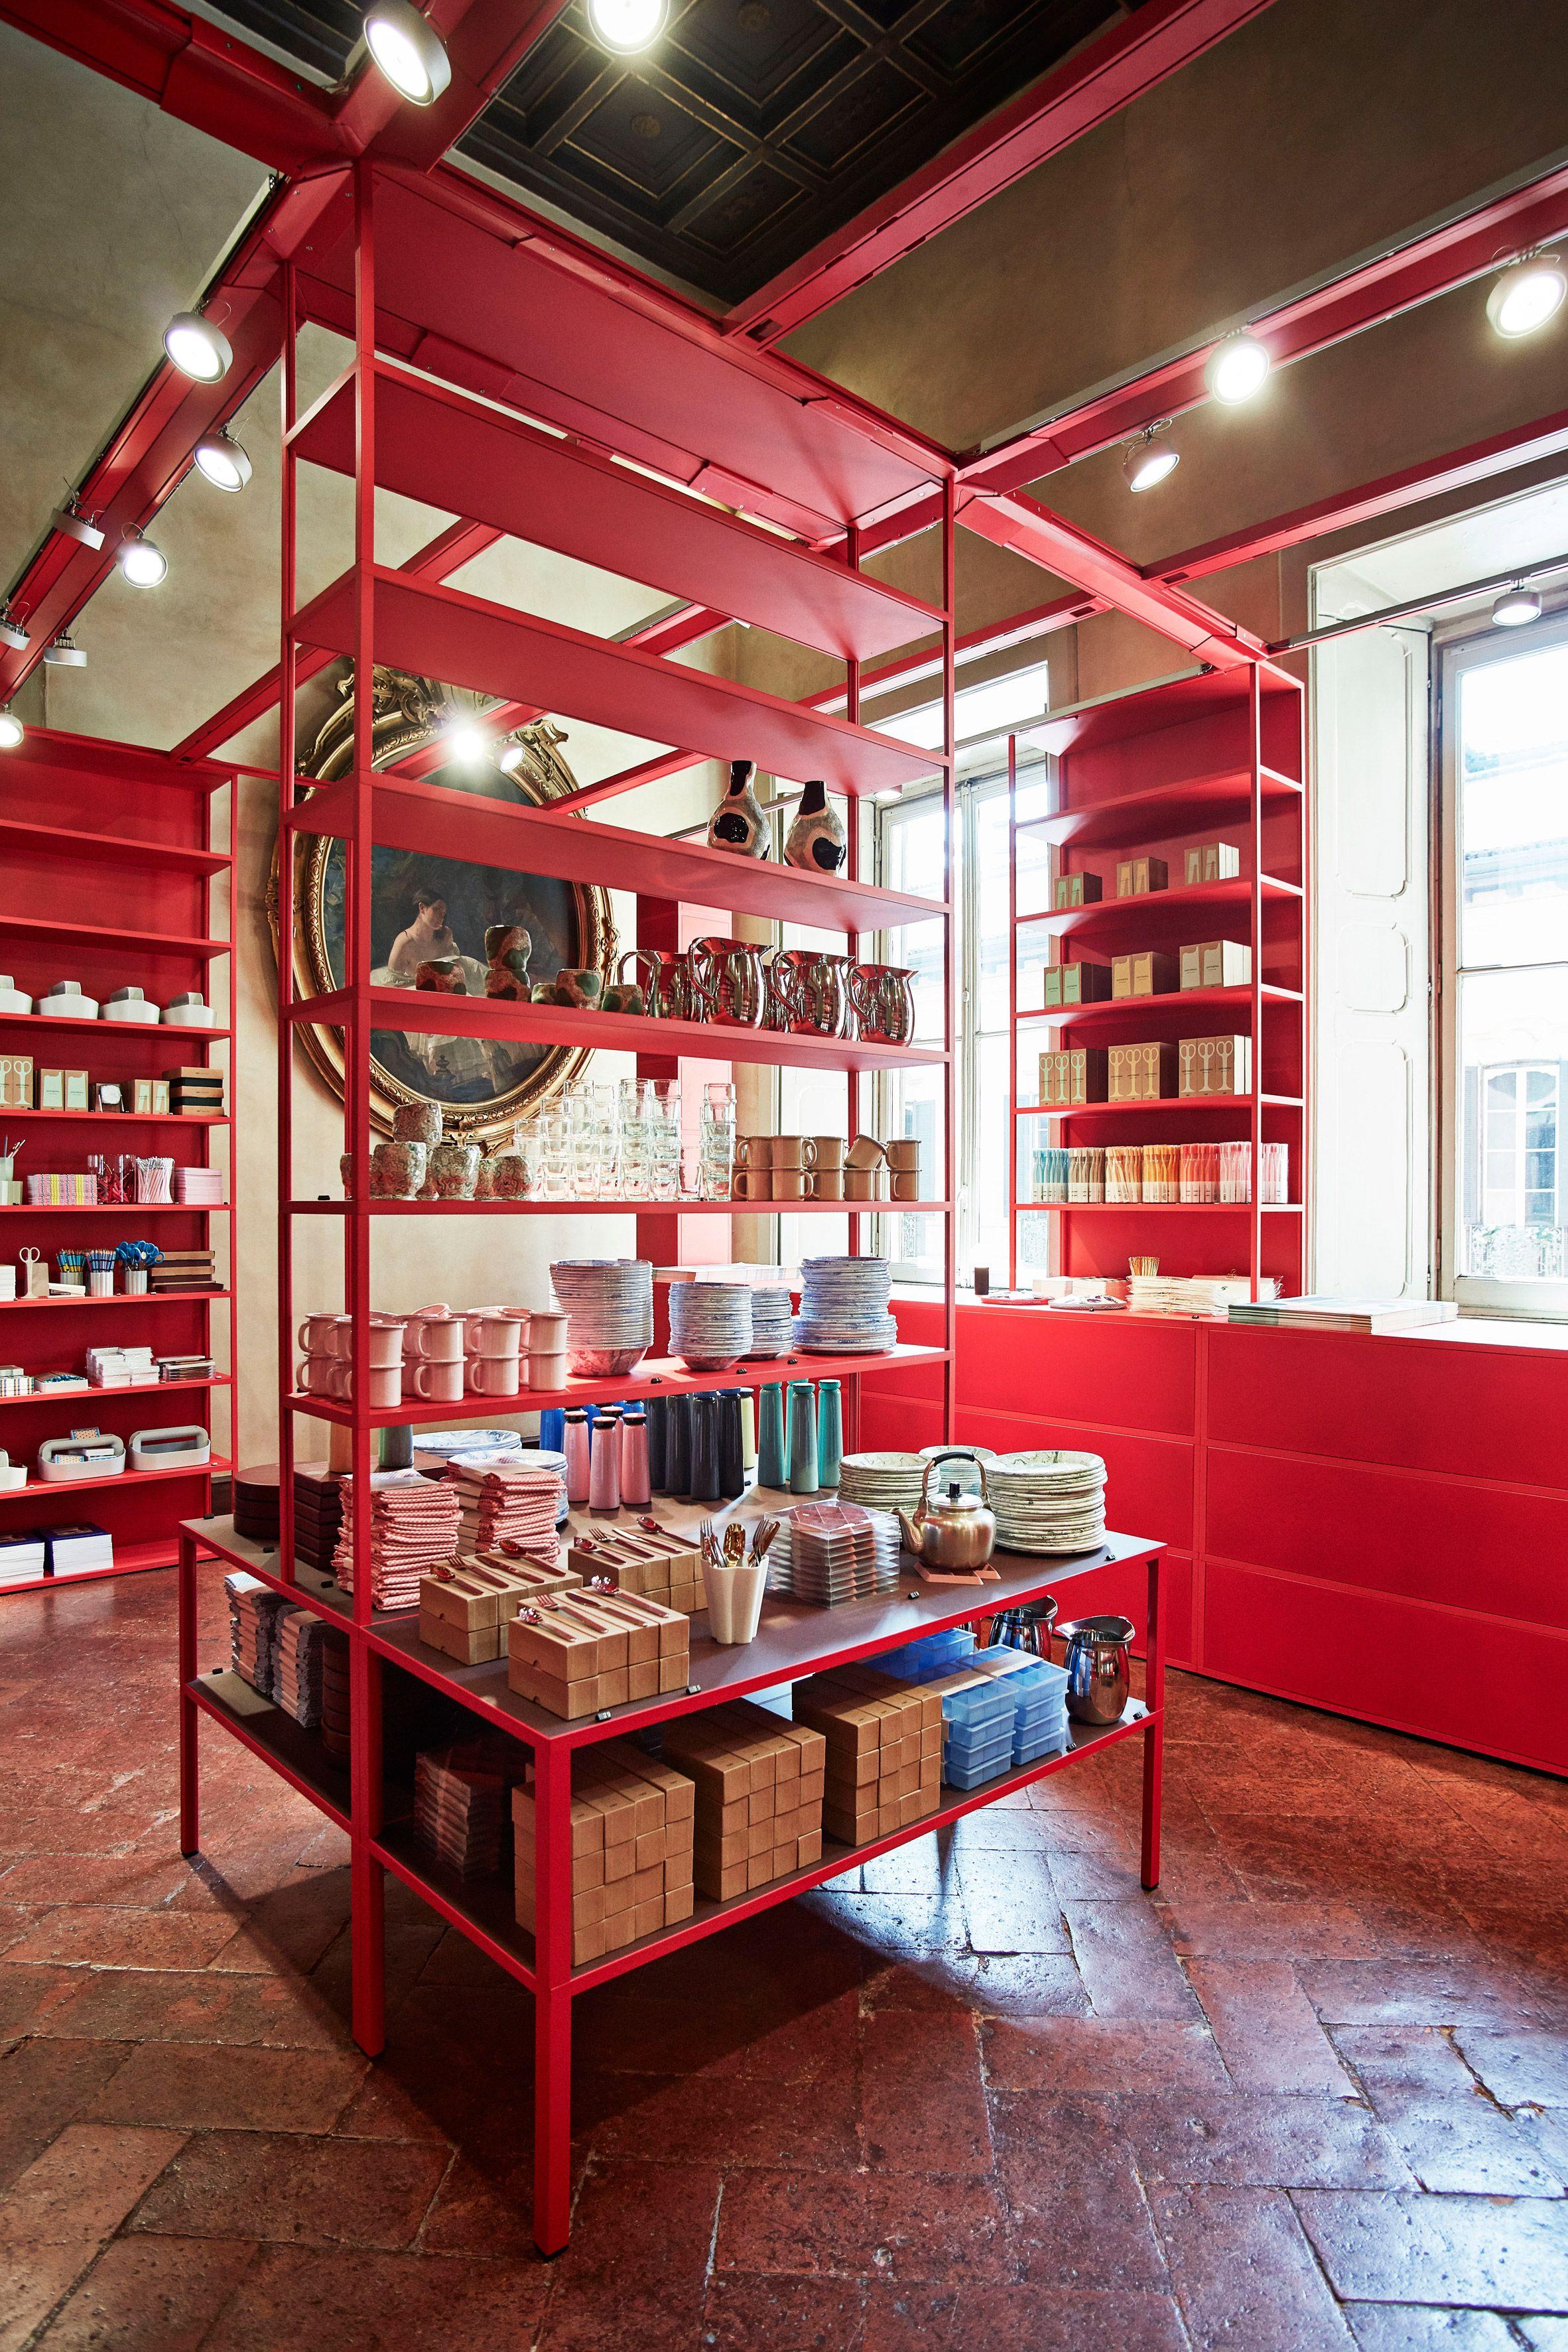 Hay x wework x sonos milan retail flagship store for Hay design milano